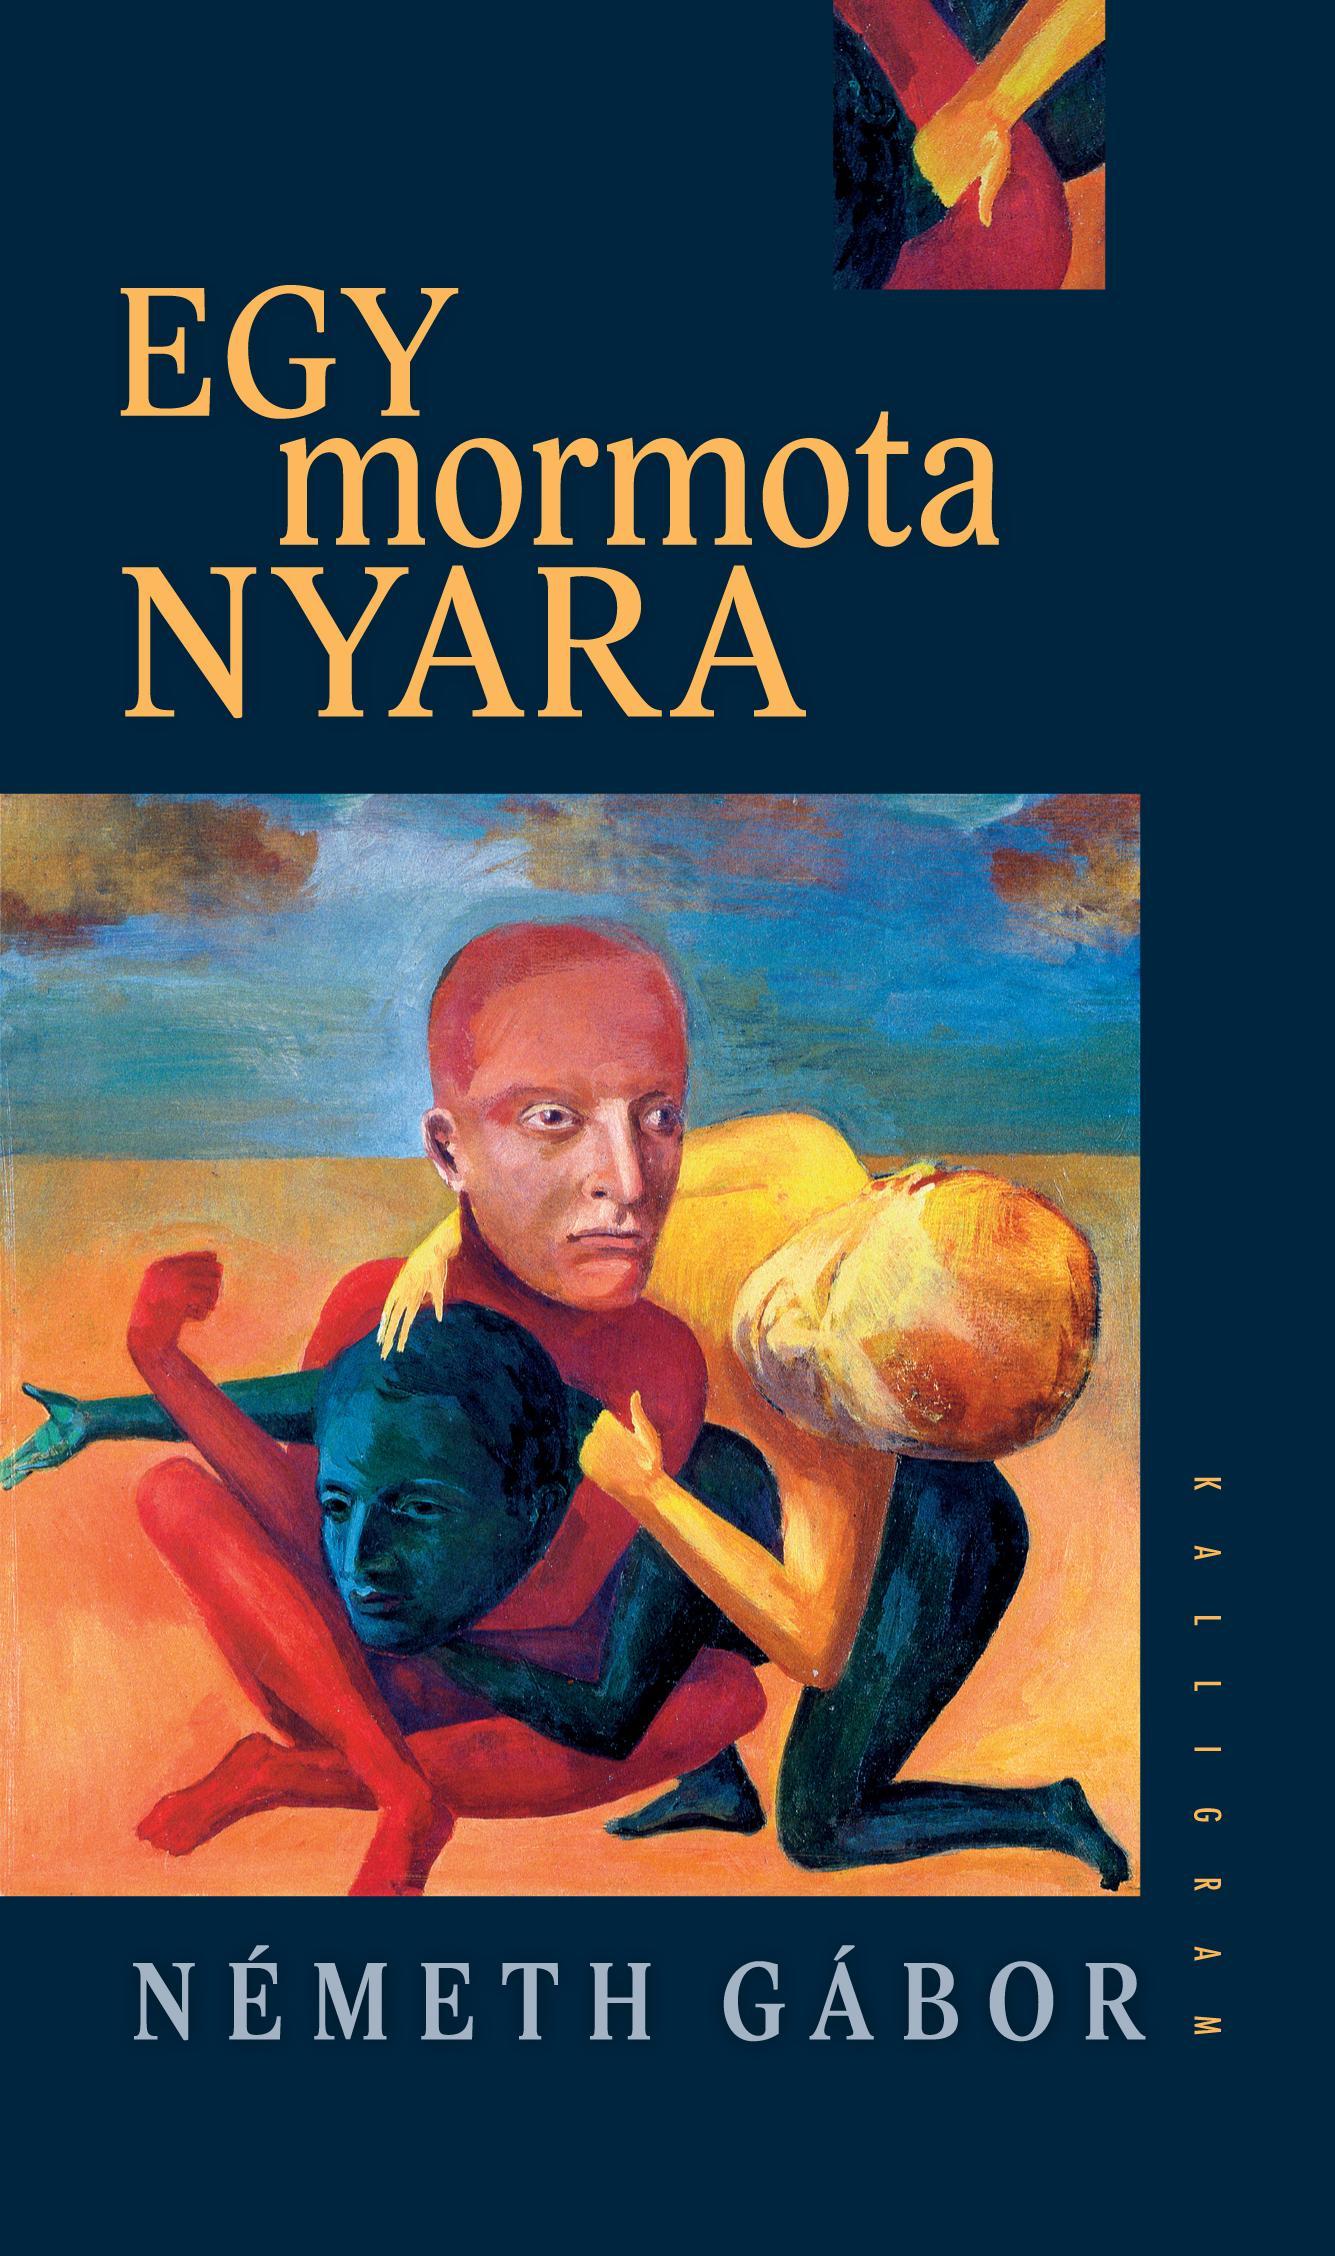 EGY MORMOTA NYARA